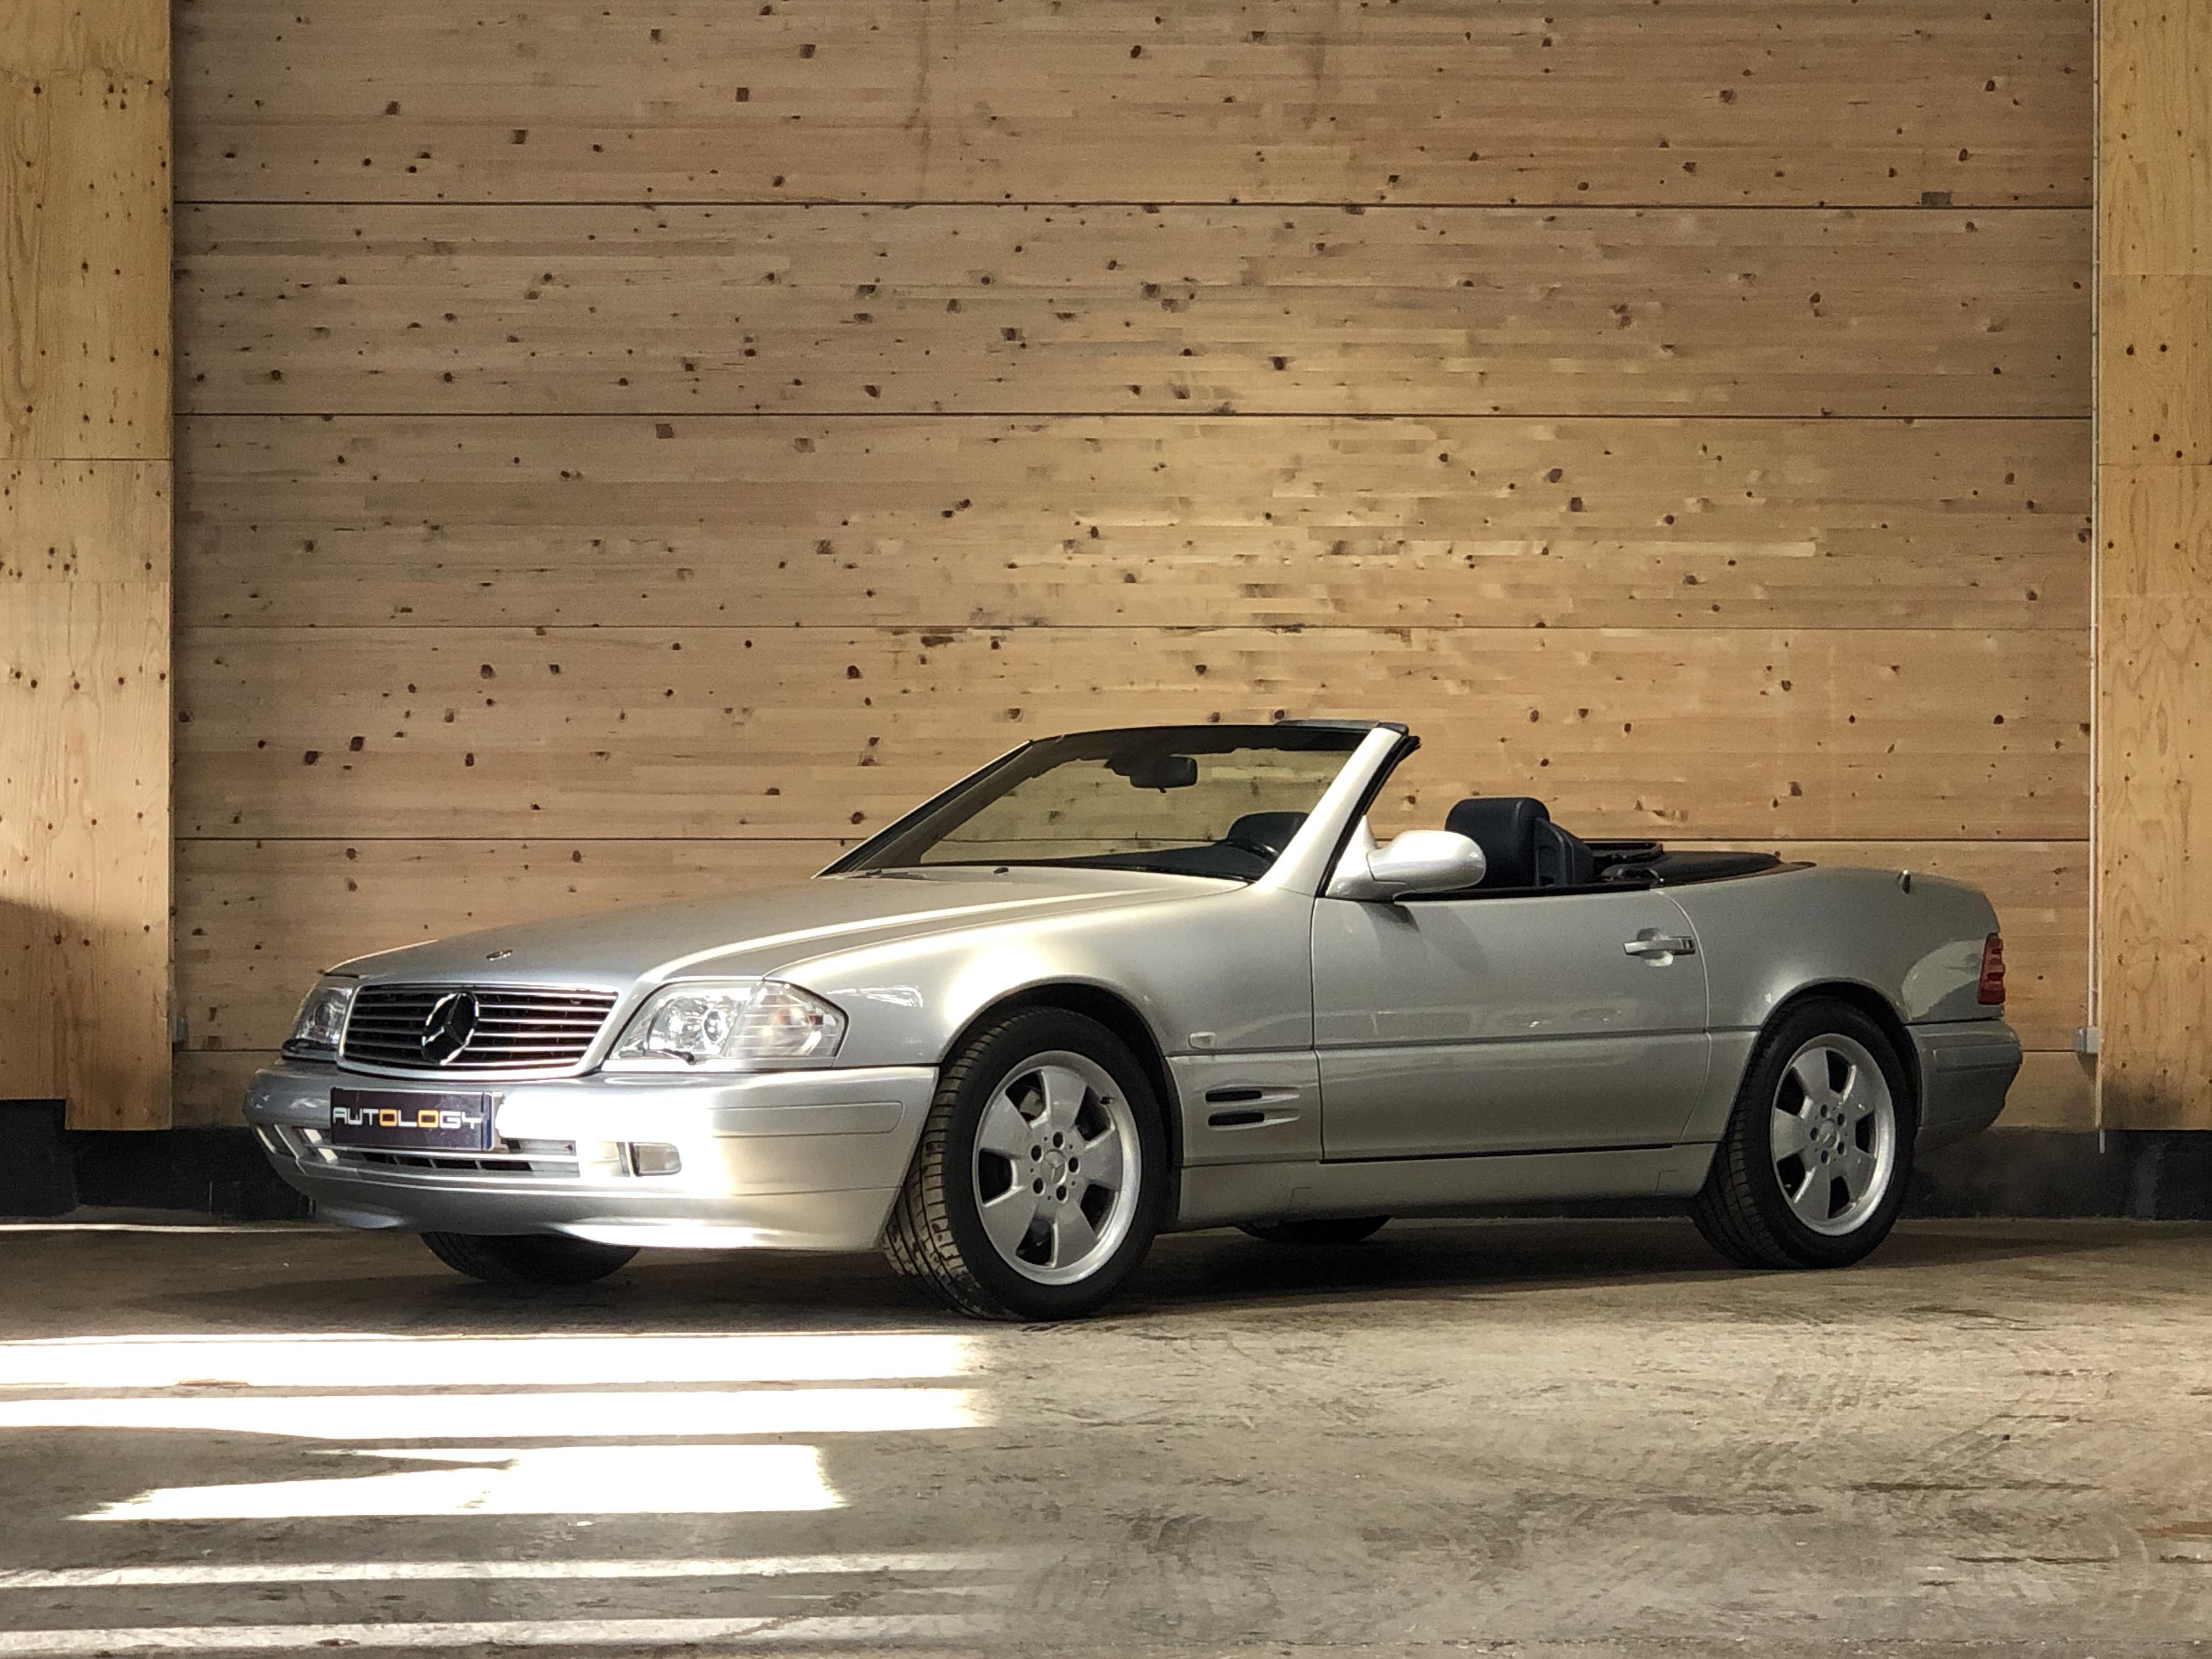 Mercedes SL 320 BVA5